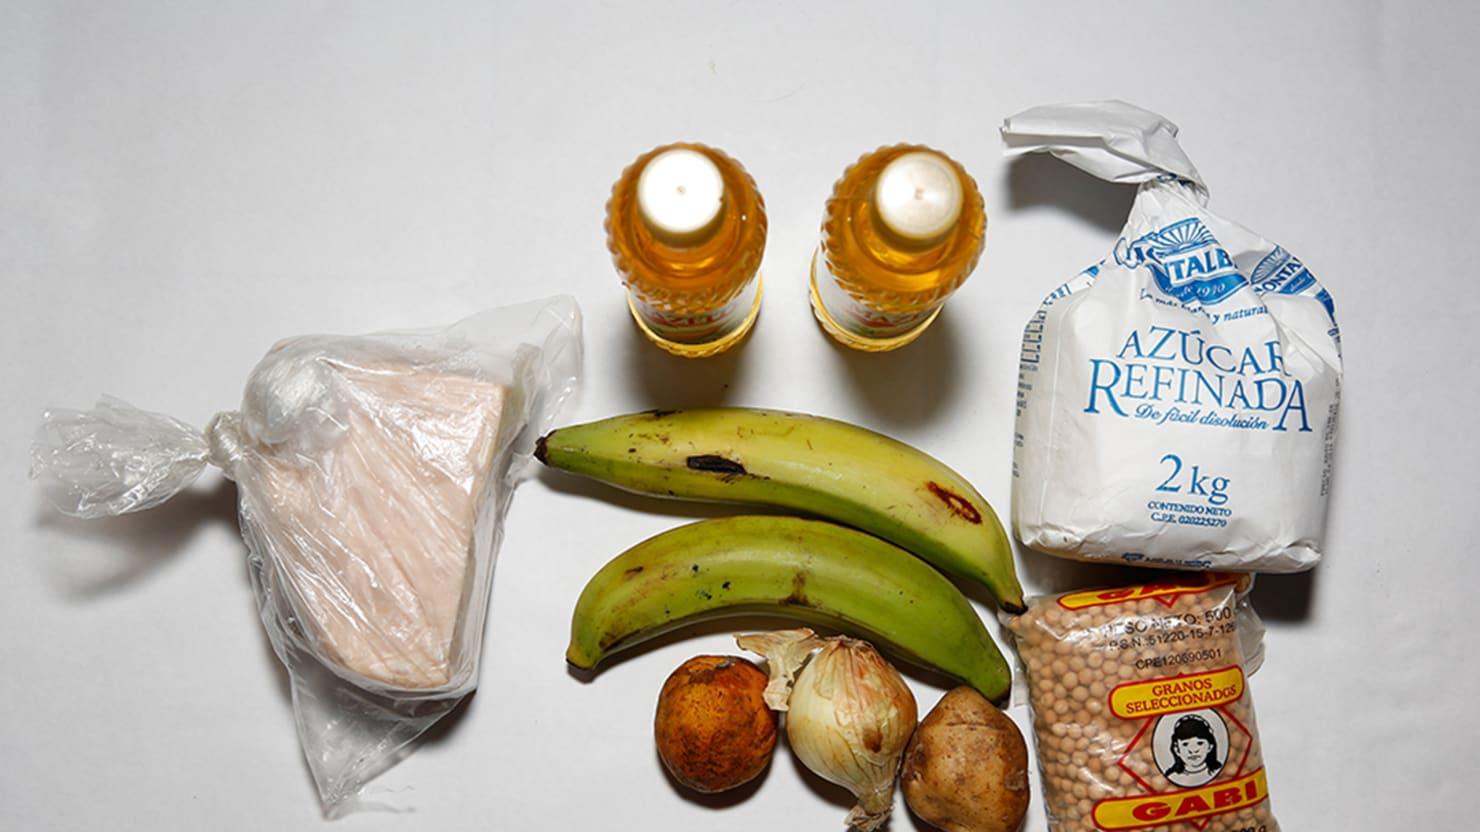 venezuela food shortage how to help